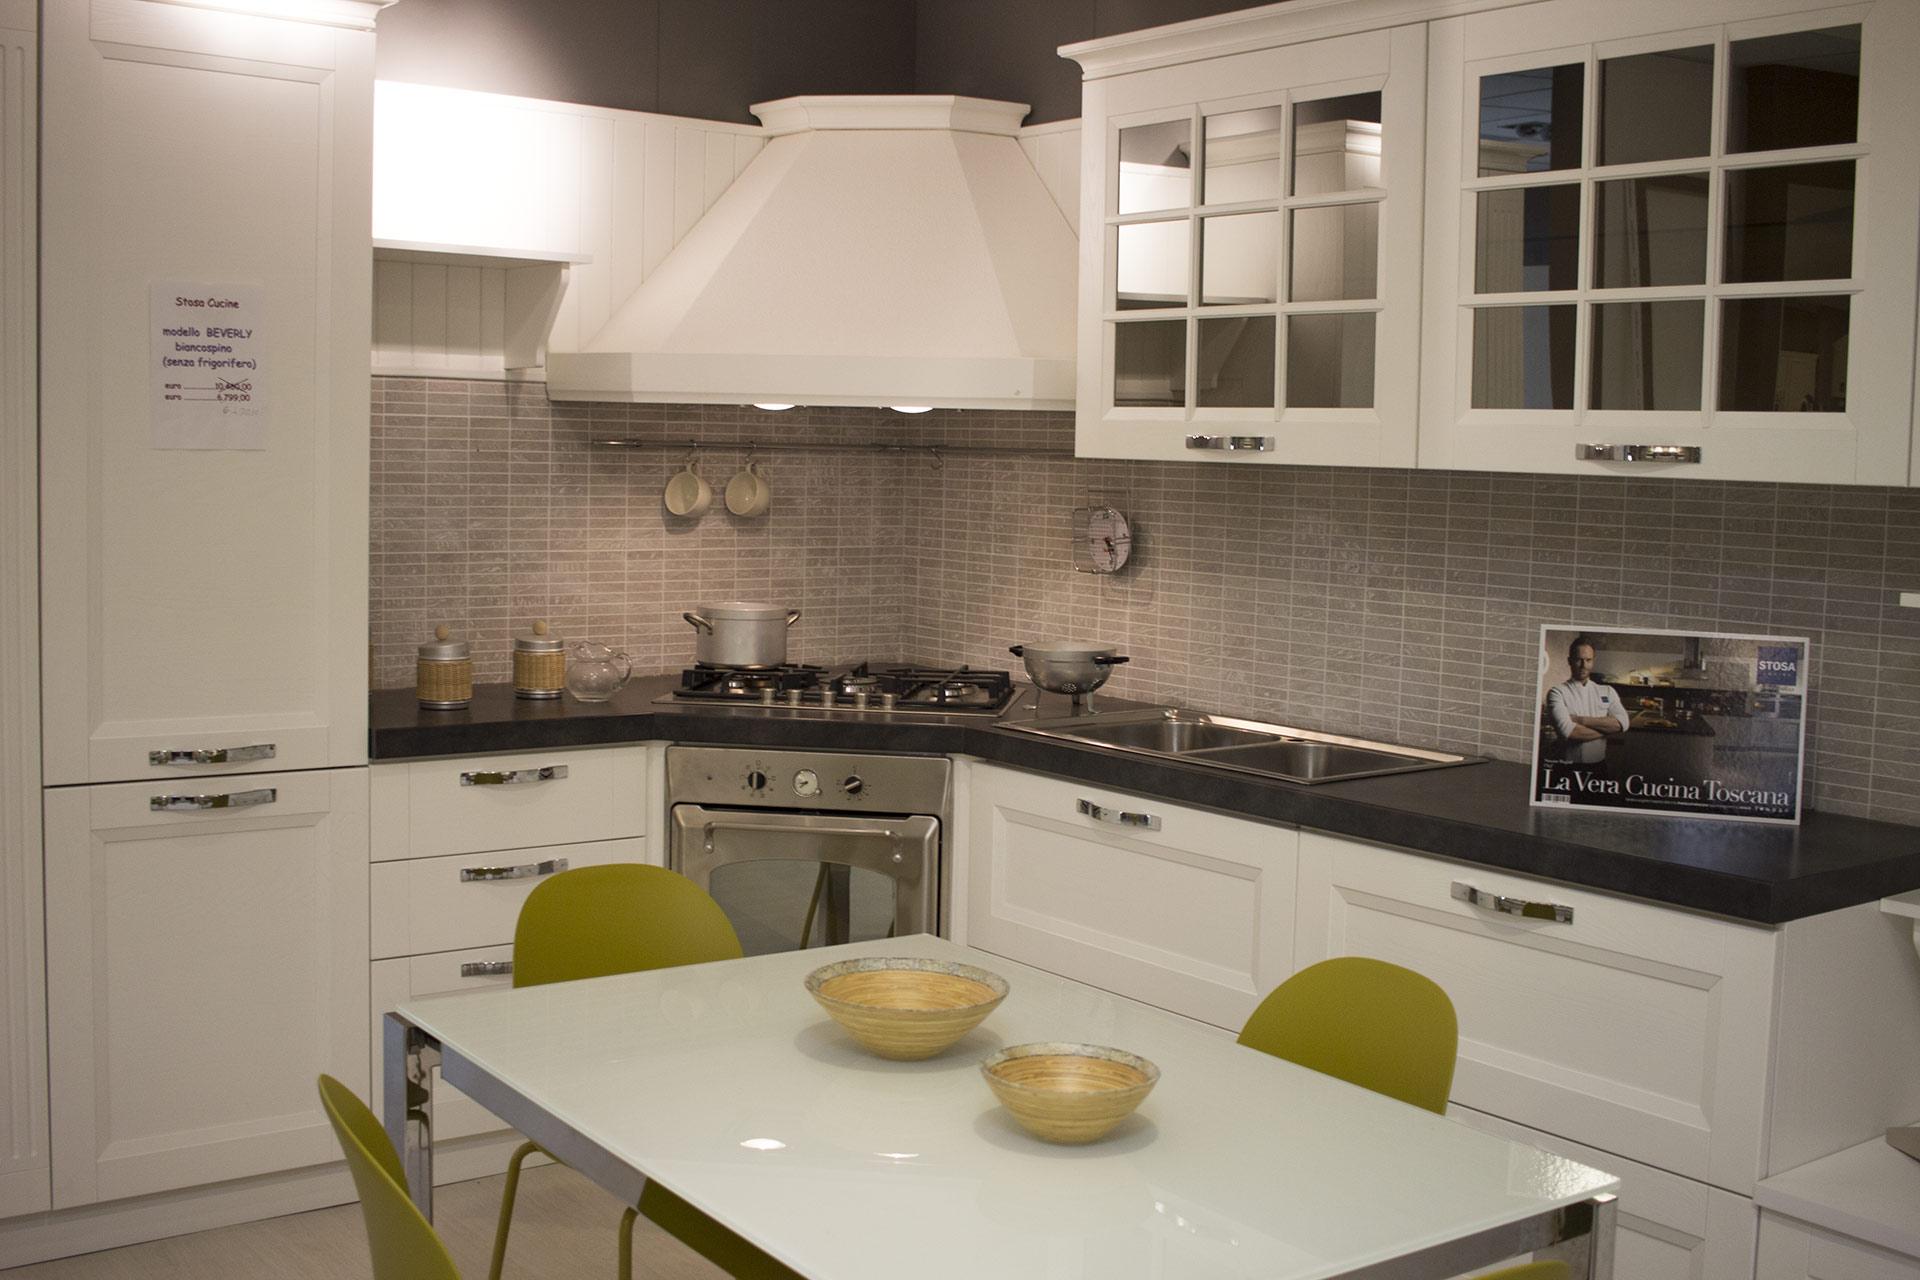 Cucine Stosa Prezzi 2018 cucine archivi - rosi mobili